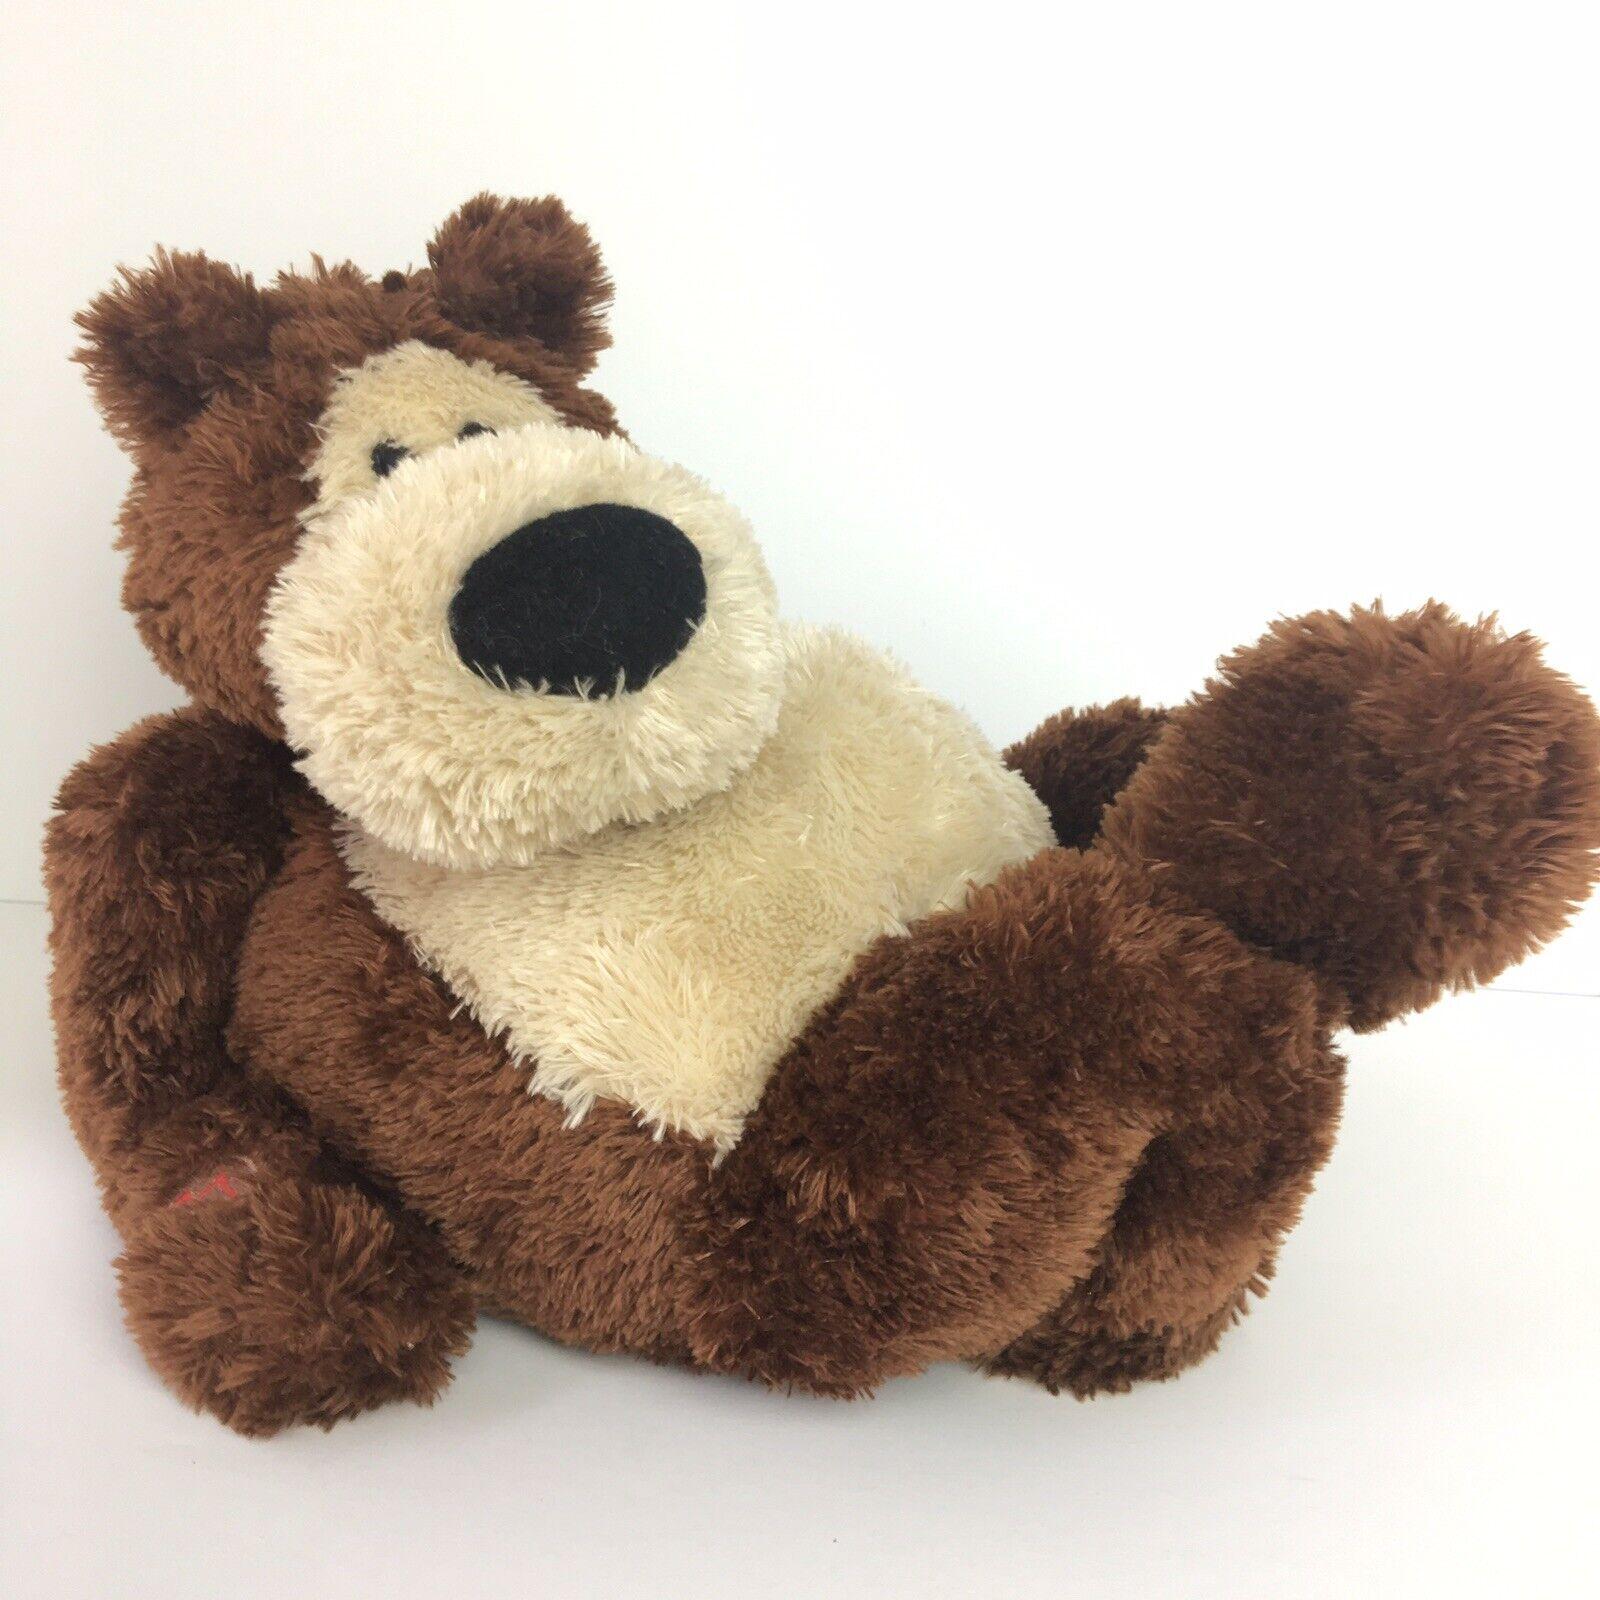 GUND FUN Plush GOOBER BEAR  ANIMATED SINGING Don't Worry Be Happy Musical?